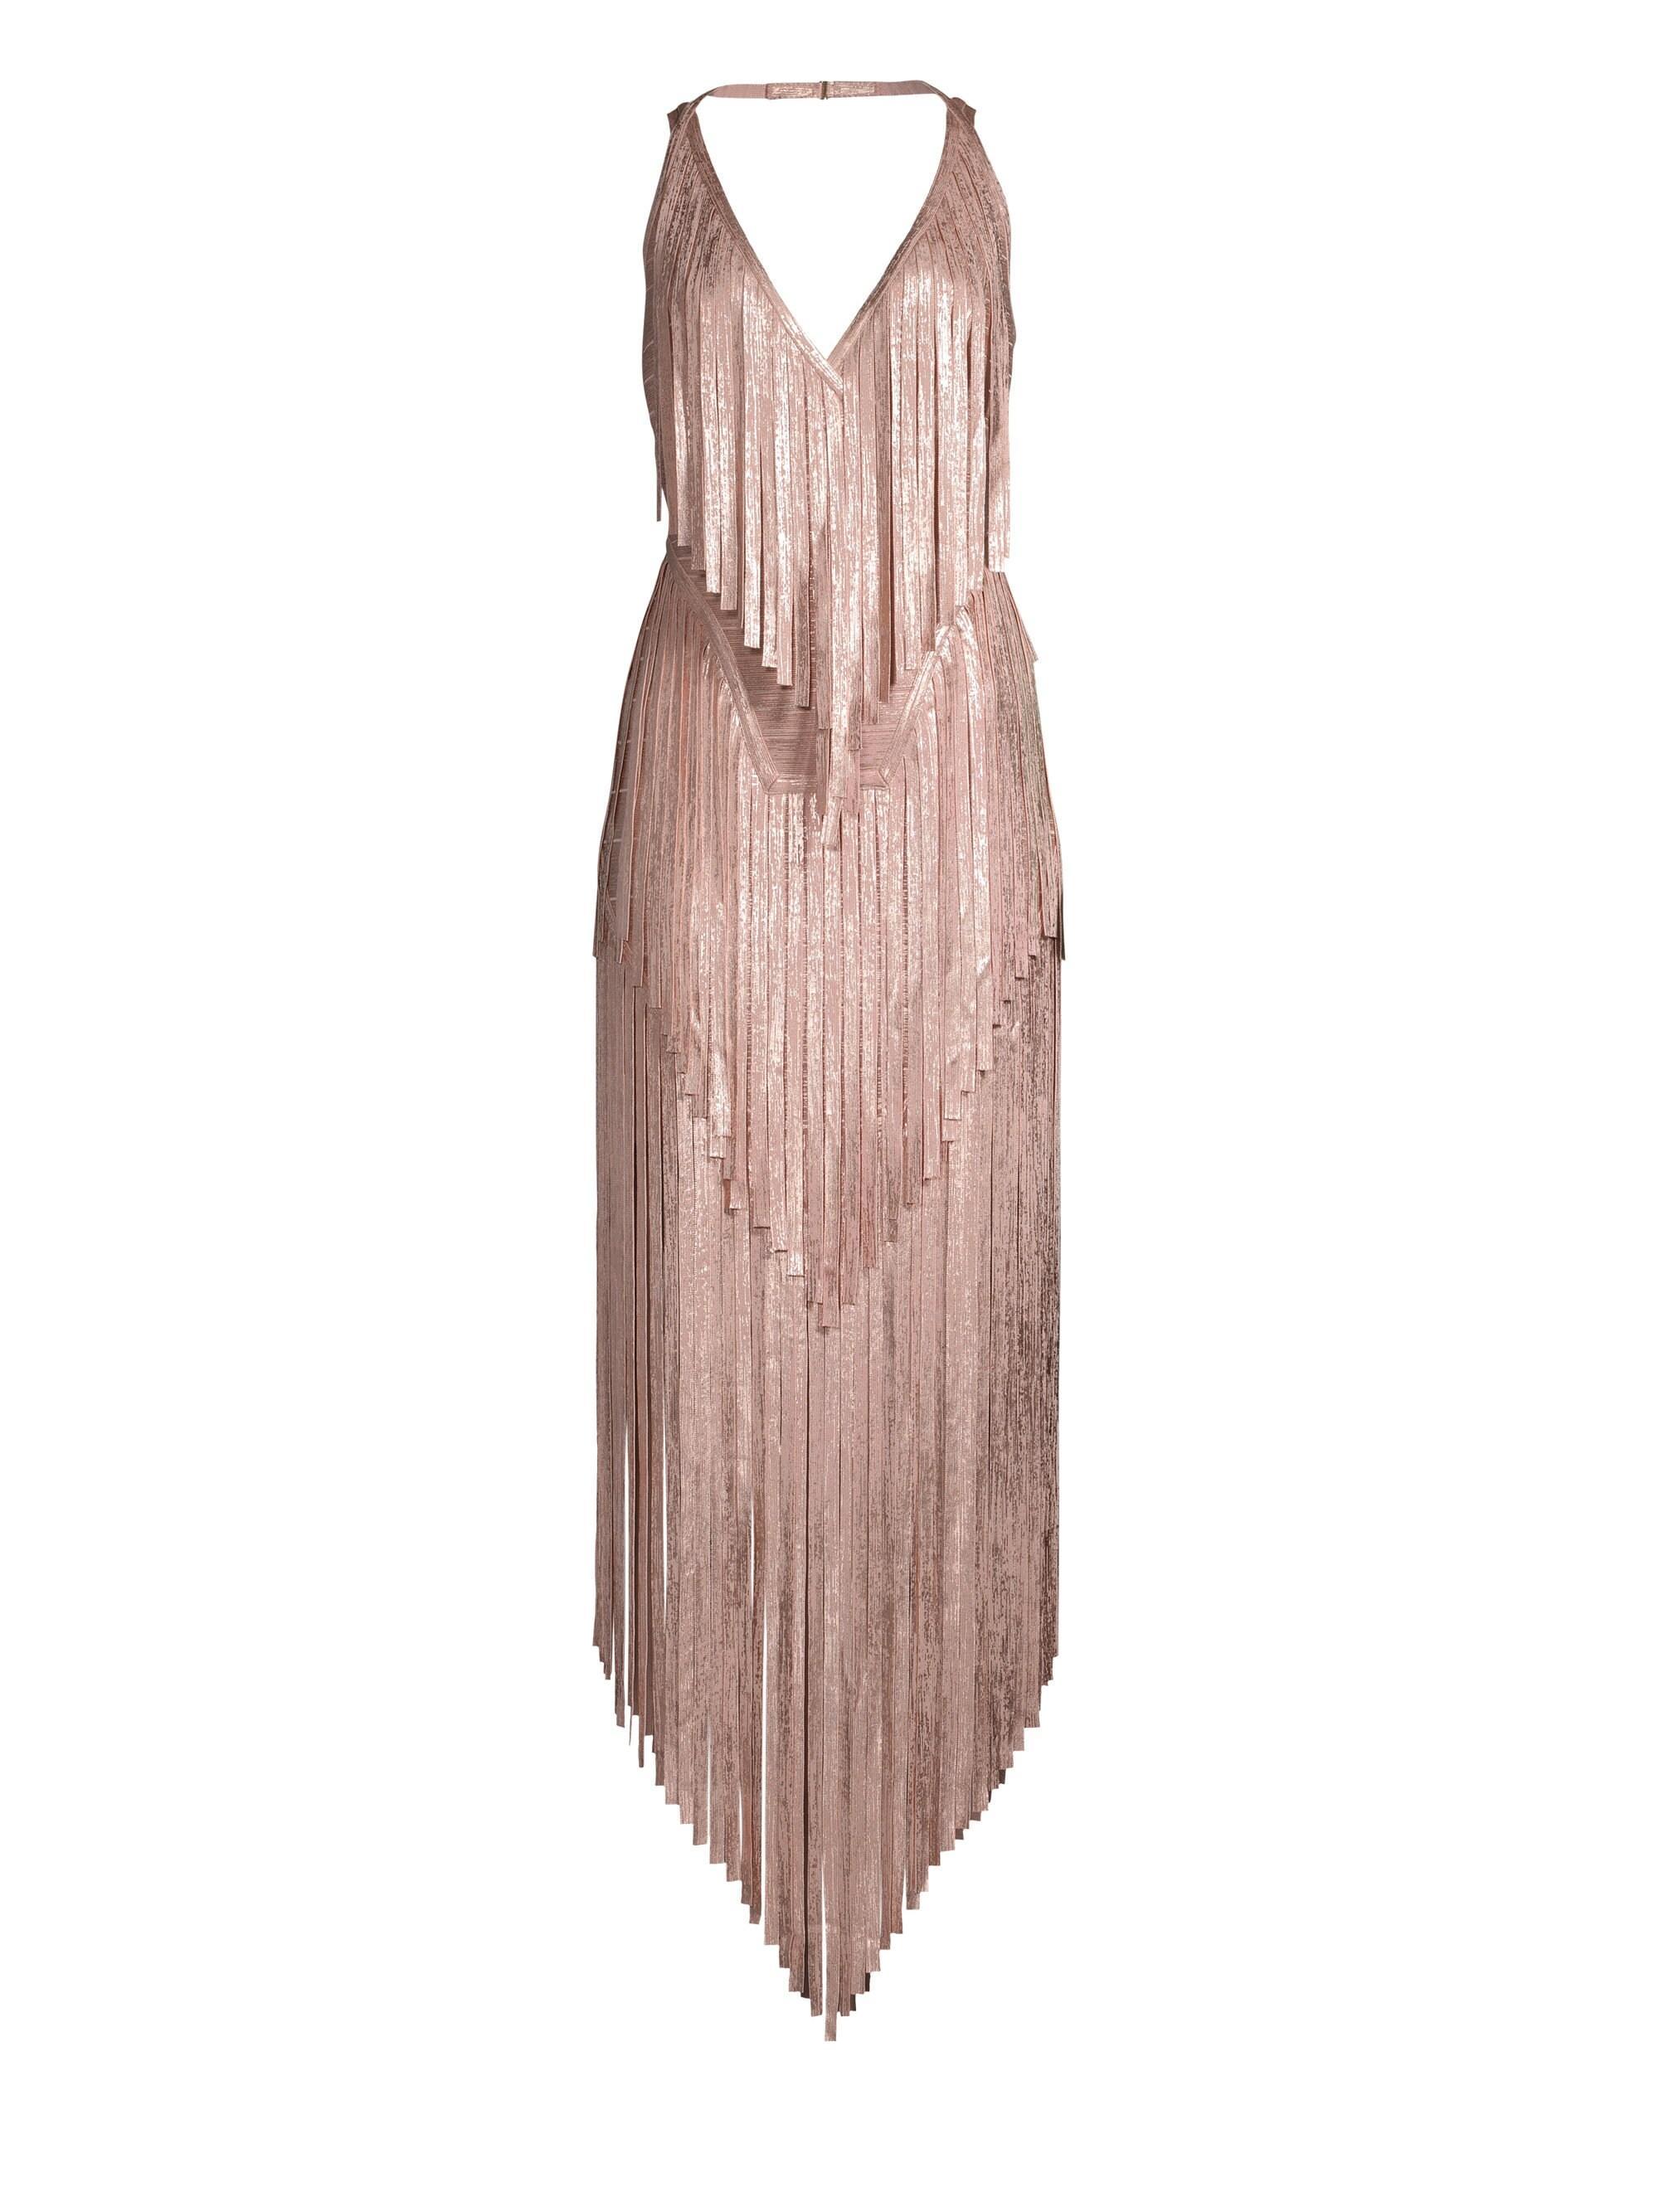 22cfc6391380 Hervé Léger Mid-calf Foil Fringe Bodycon Dress in Pink - Lyst